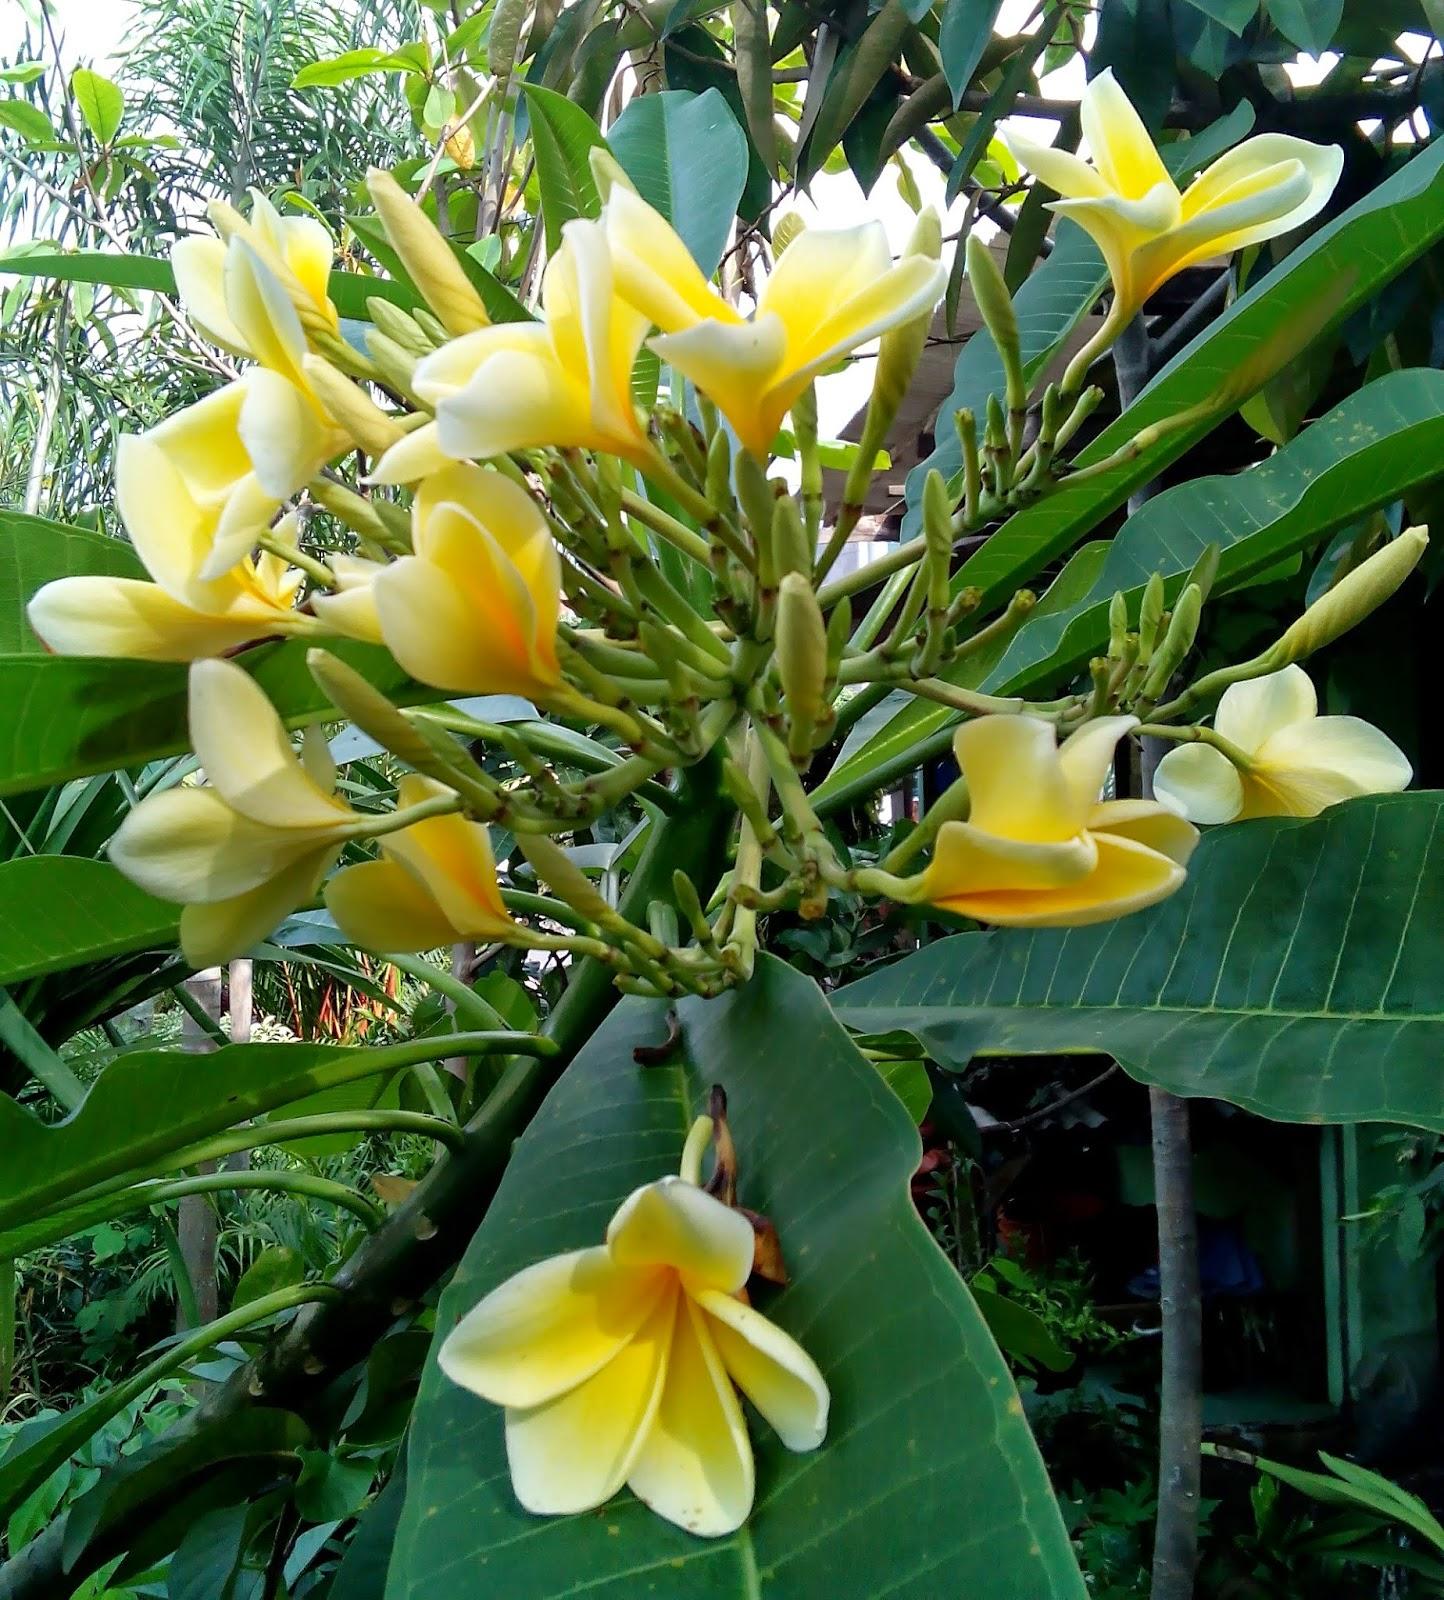 Indahnya Bunga Pohon Kamboja - Education Articles